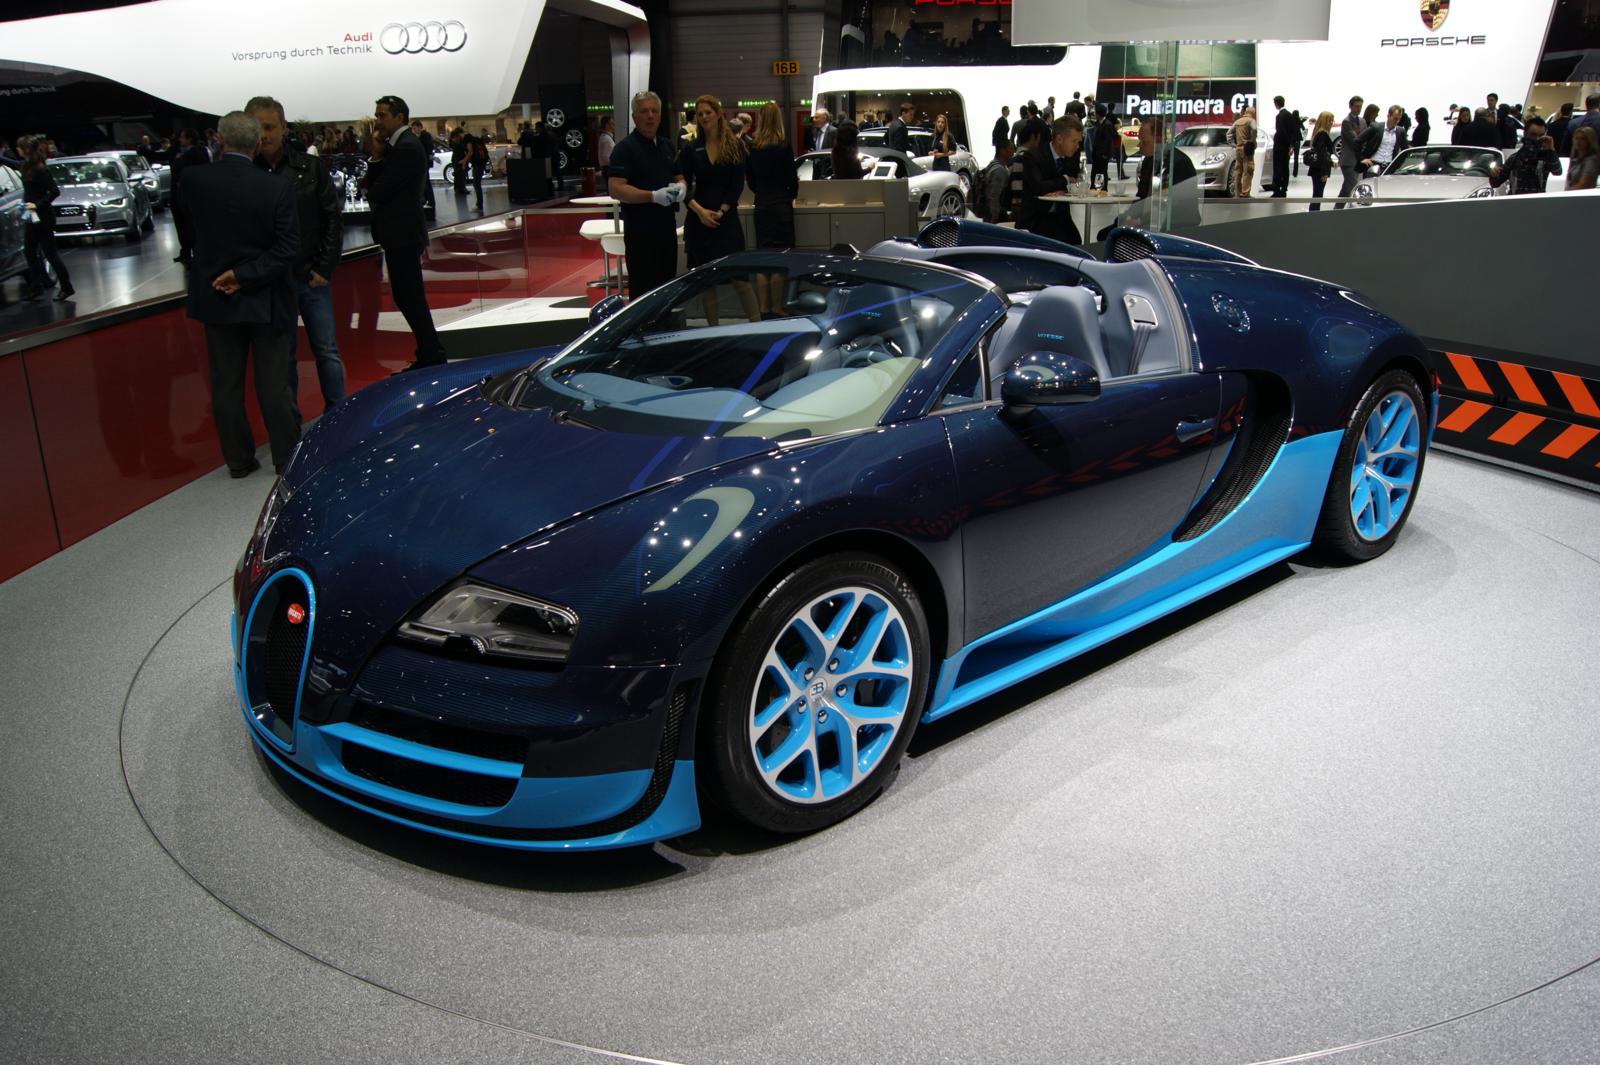 geneva 2012 bugatti veyron grand sport vitesse front seat driver. Black Bedroom Furniture Sets. Home Design Ideas